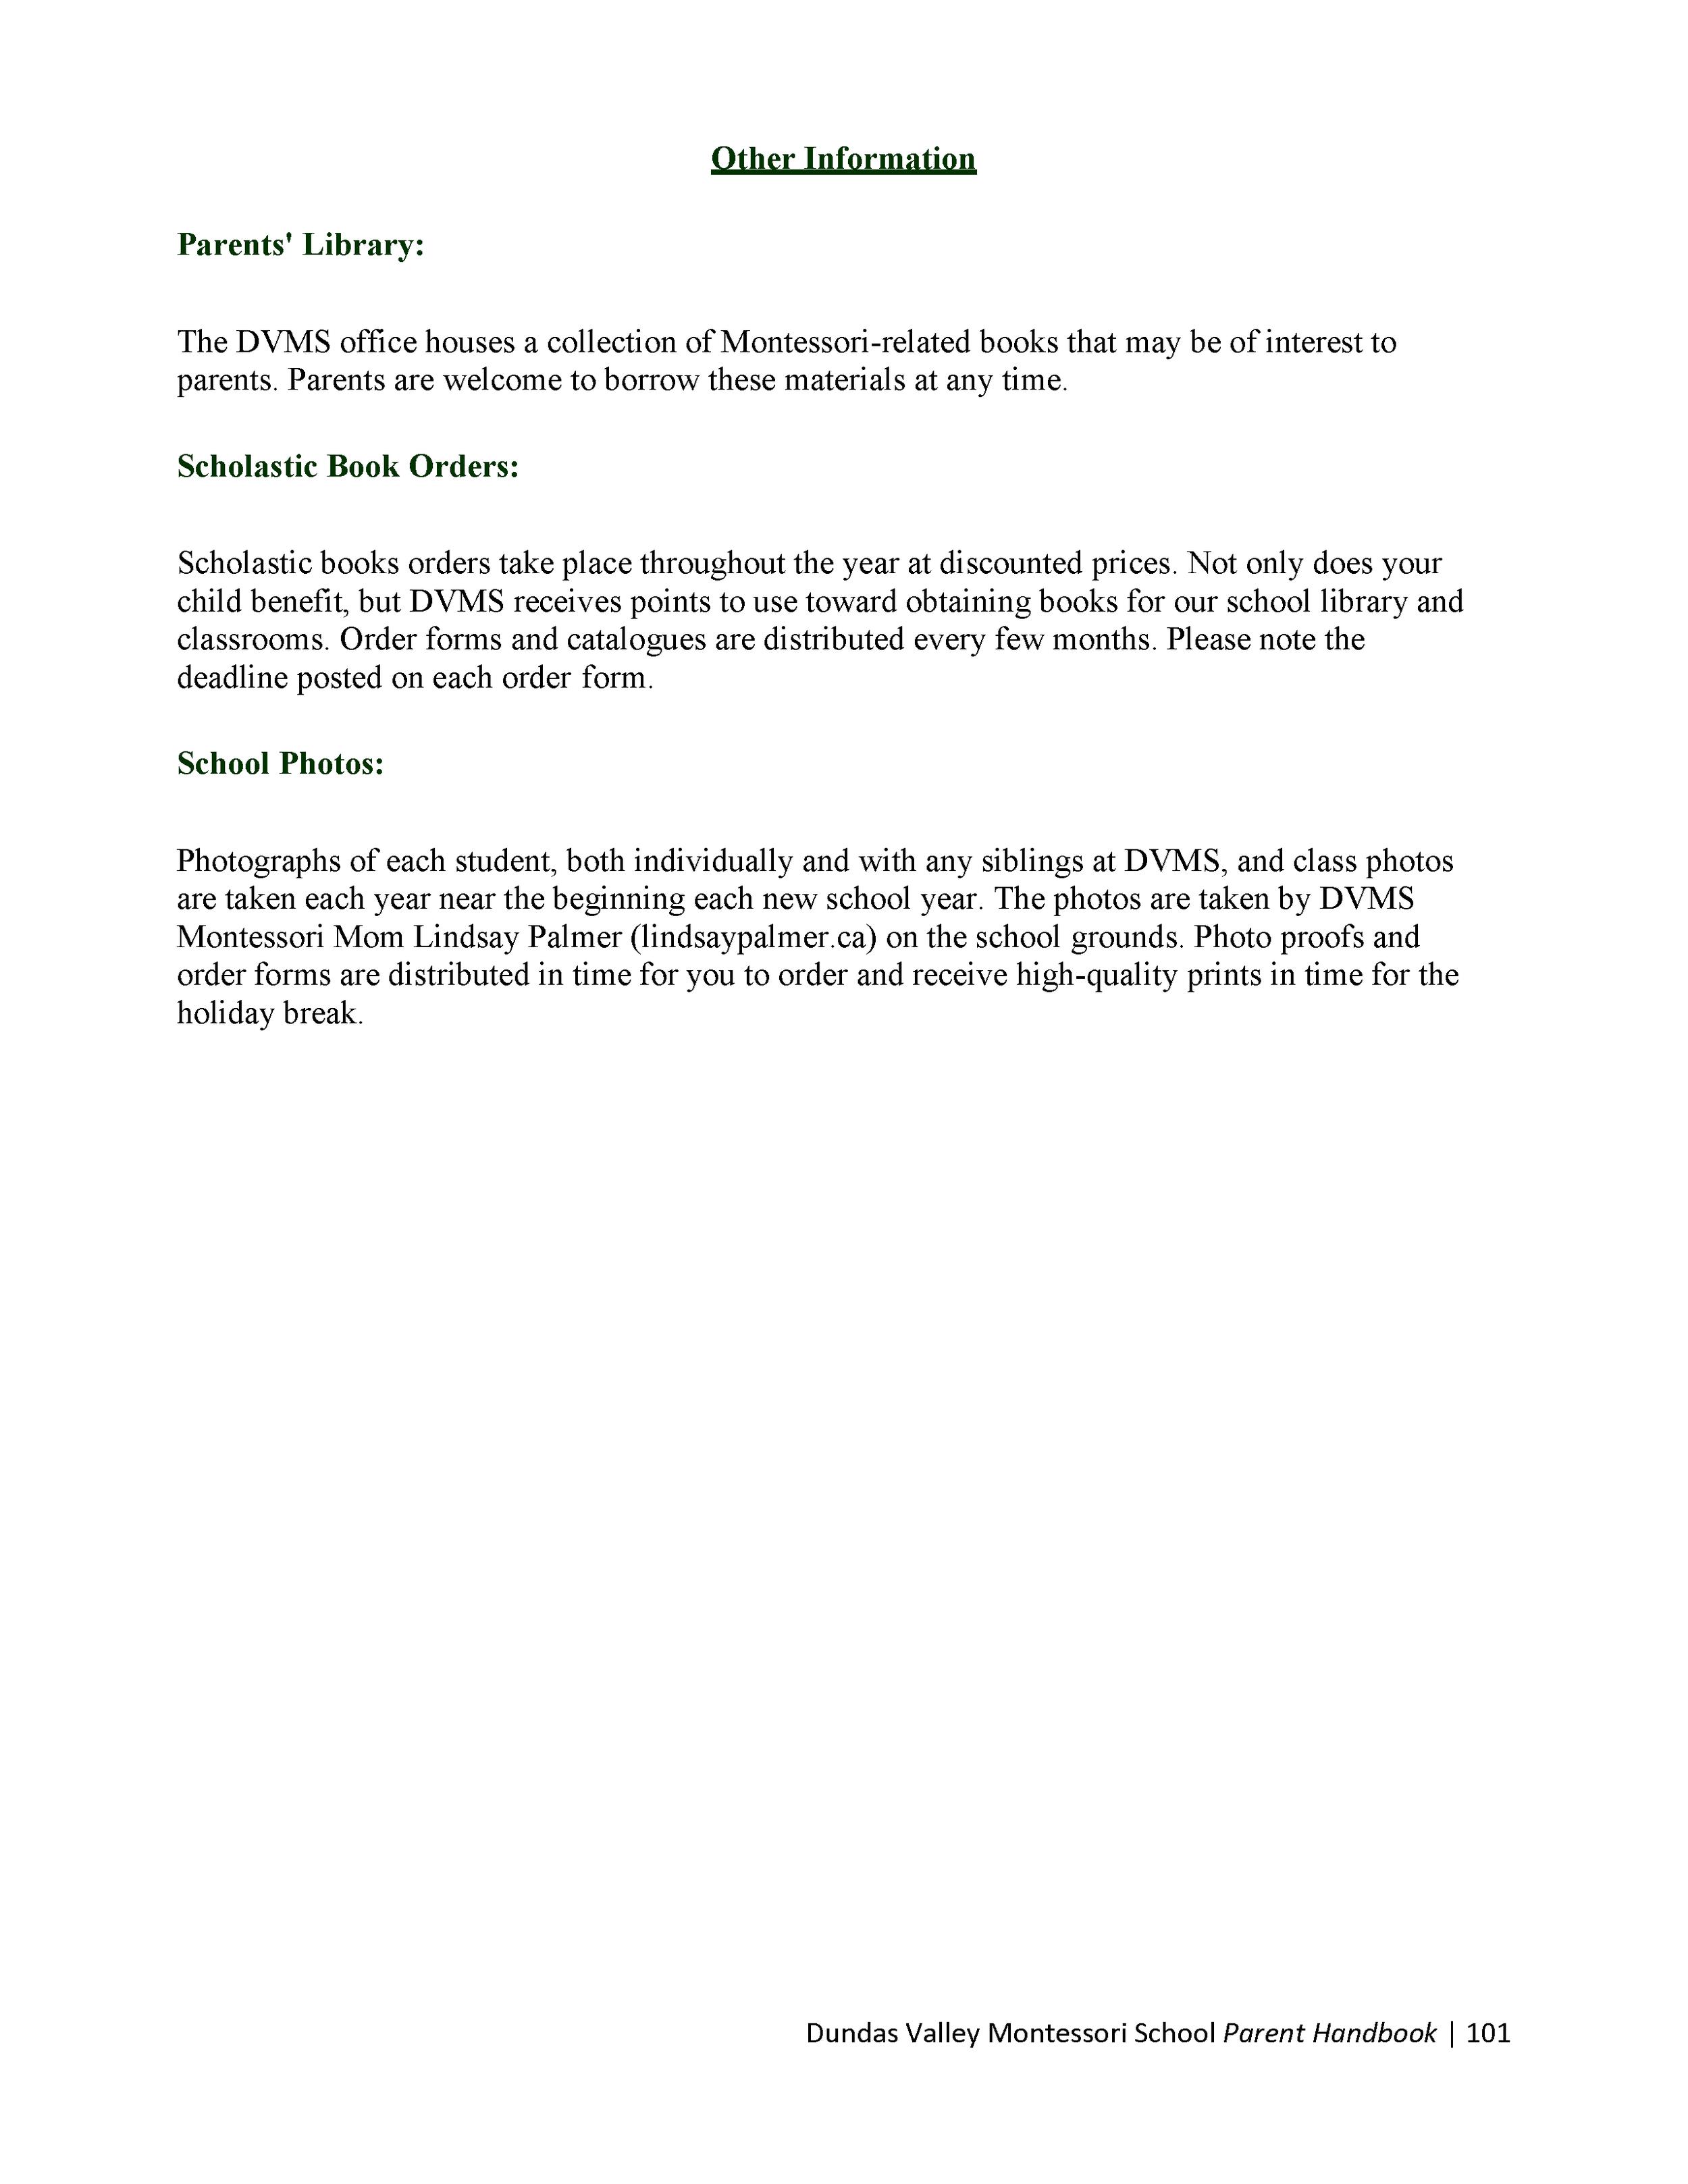 DVMS-Parent-Handbook-19-20_Page_103.png